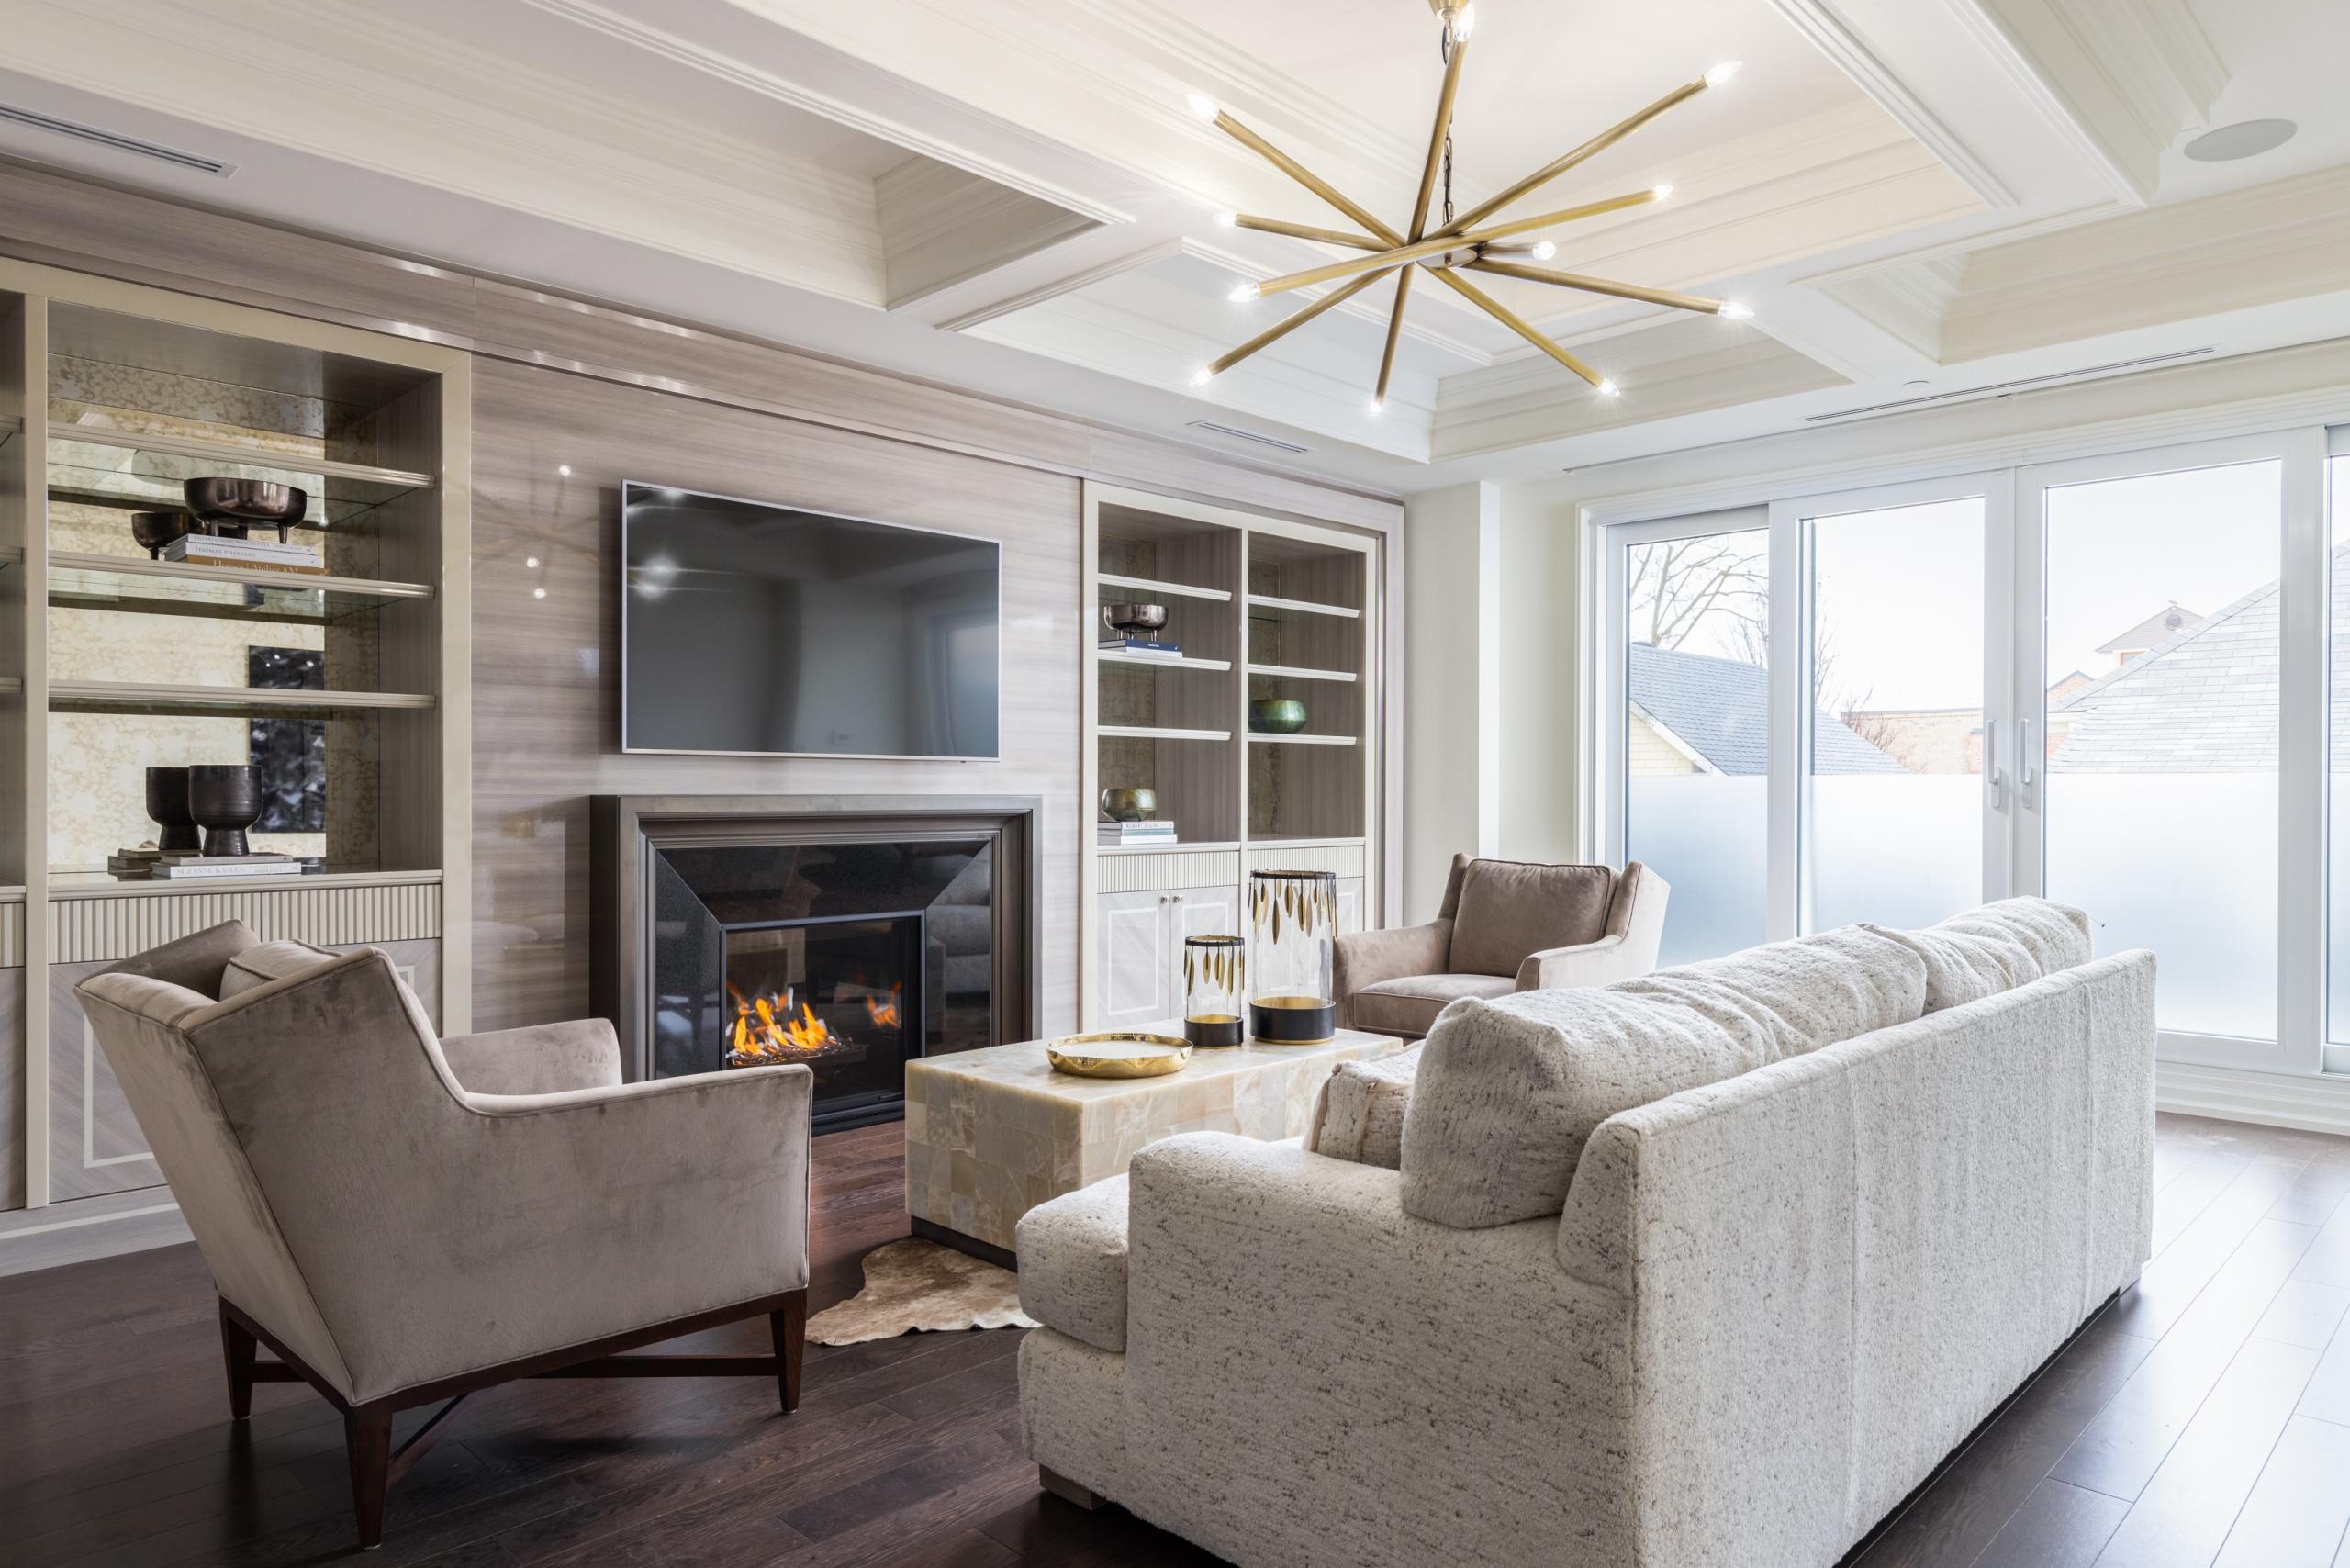 Living room featured at 208 - 300 Randall Street, Oakville at Alex Irish & Associates